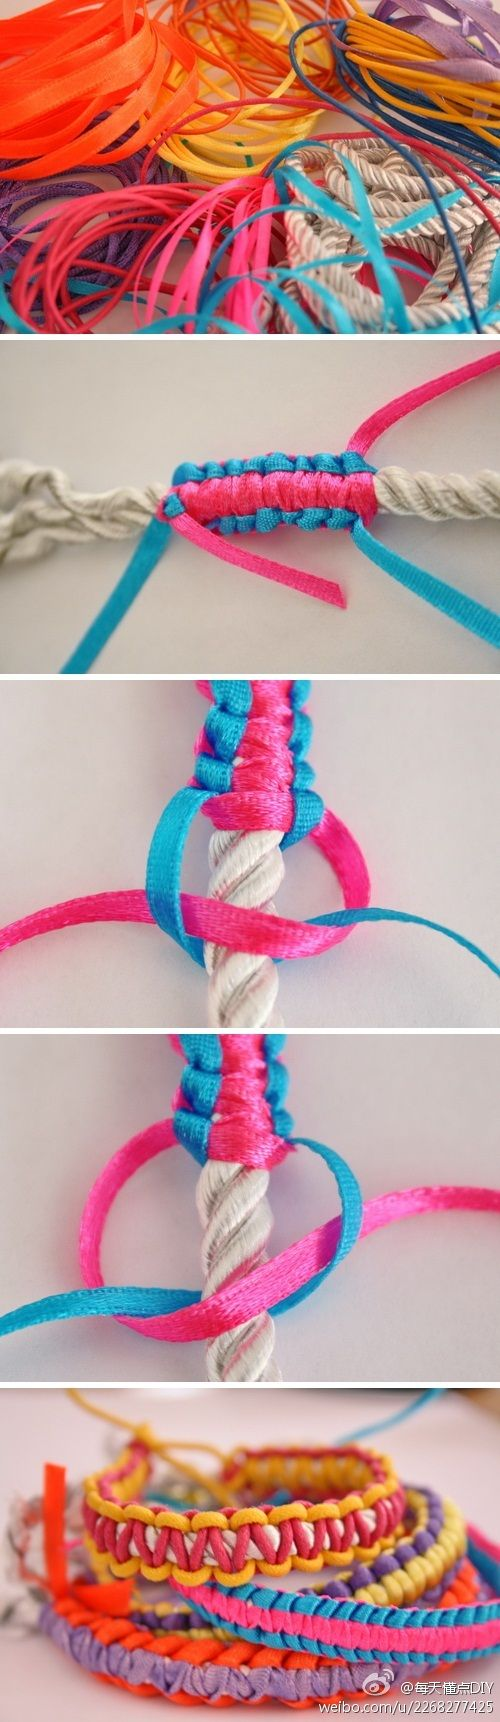 best bracelets images on pinterest at home beads and bracelet